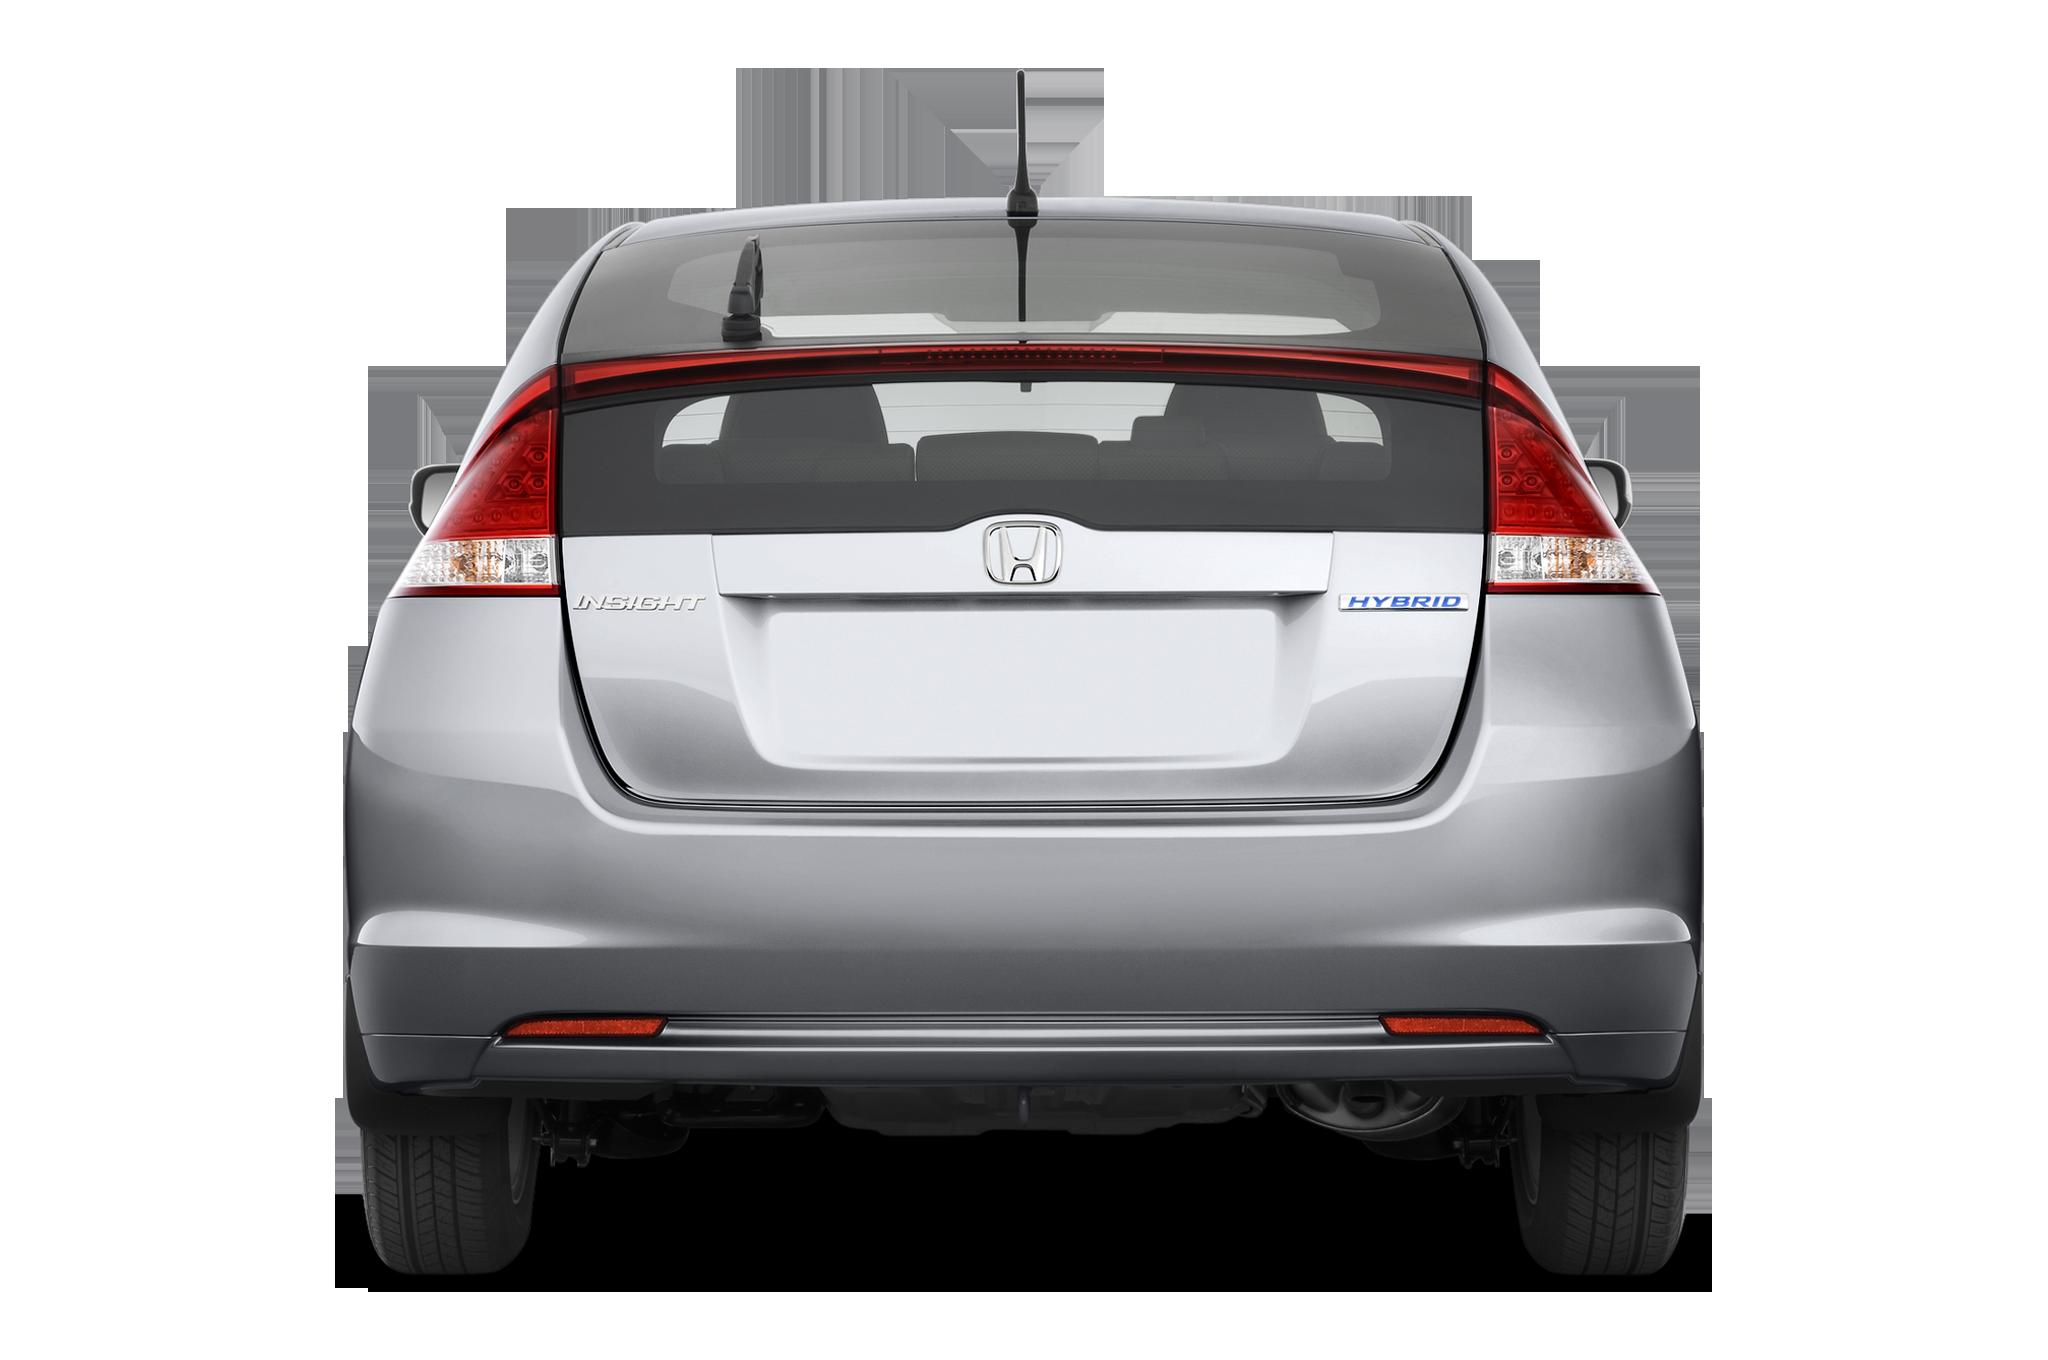 2010 Honda Insight - Fuel Efficient Cars, Hybrids and ...